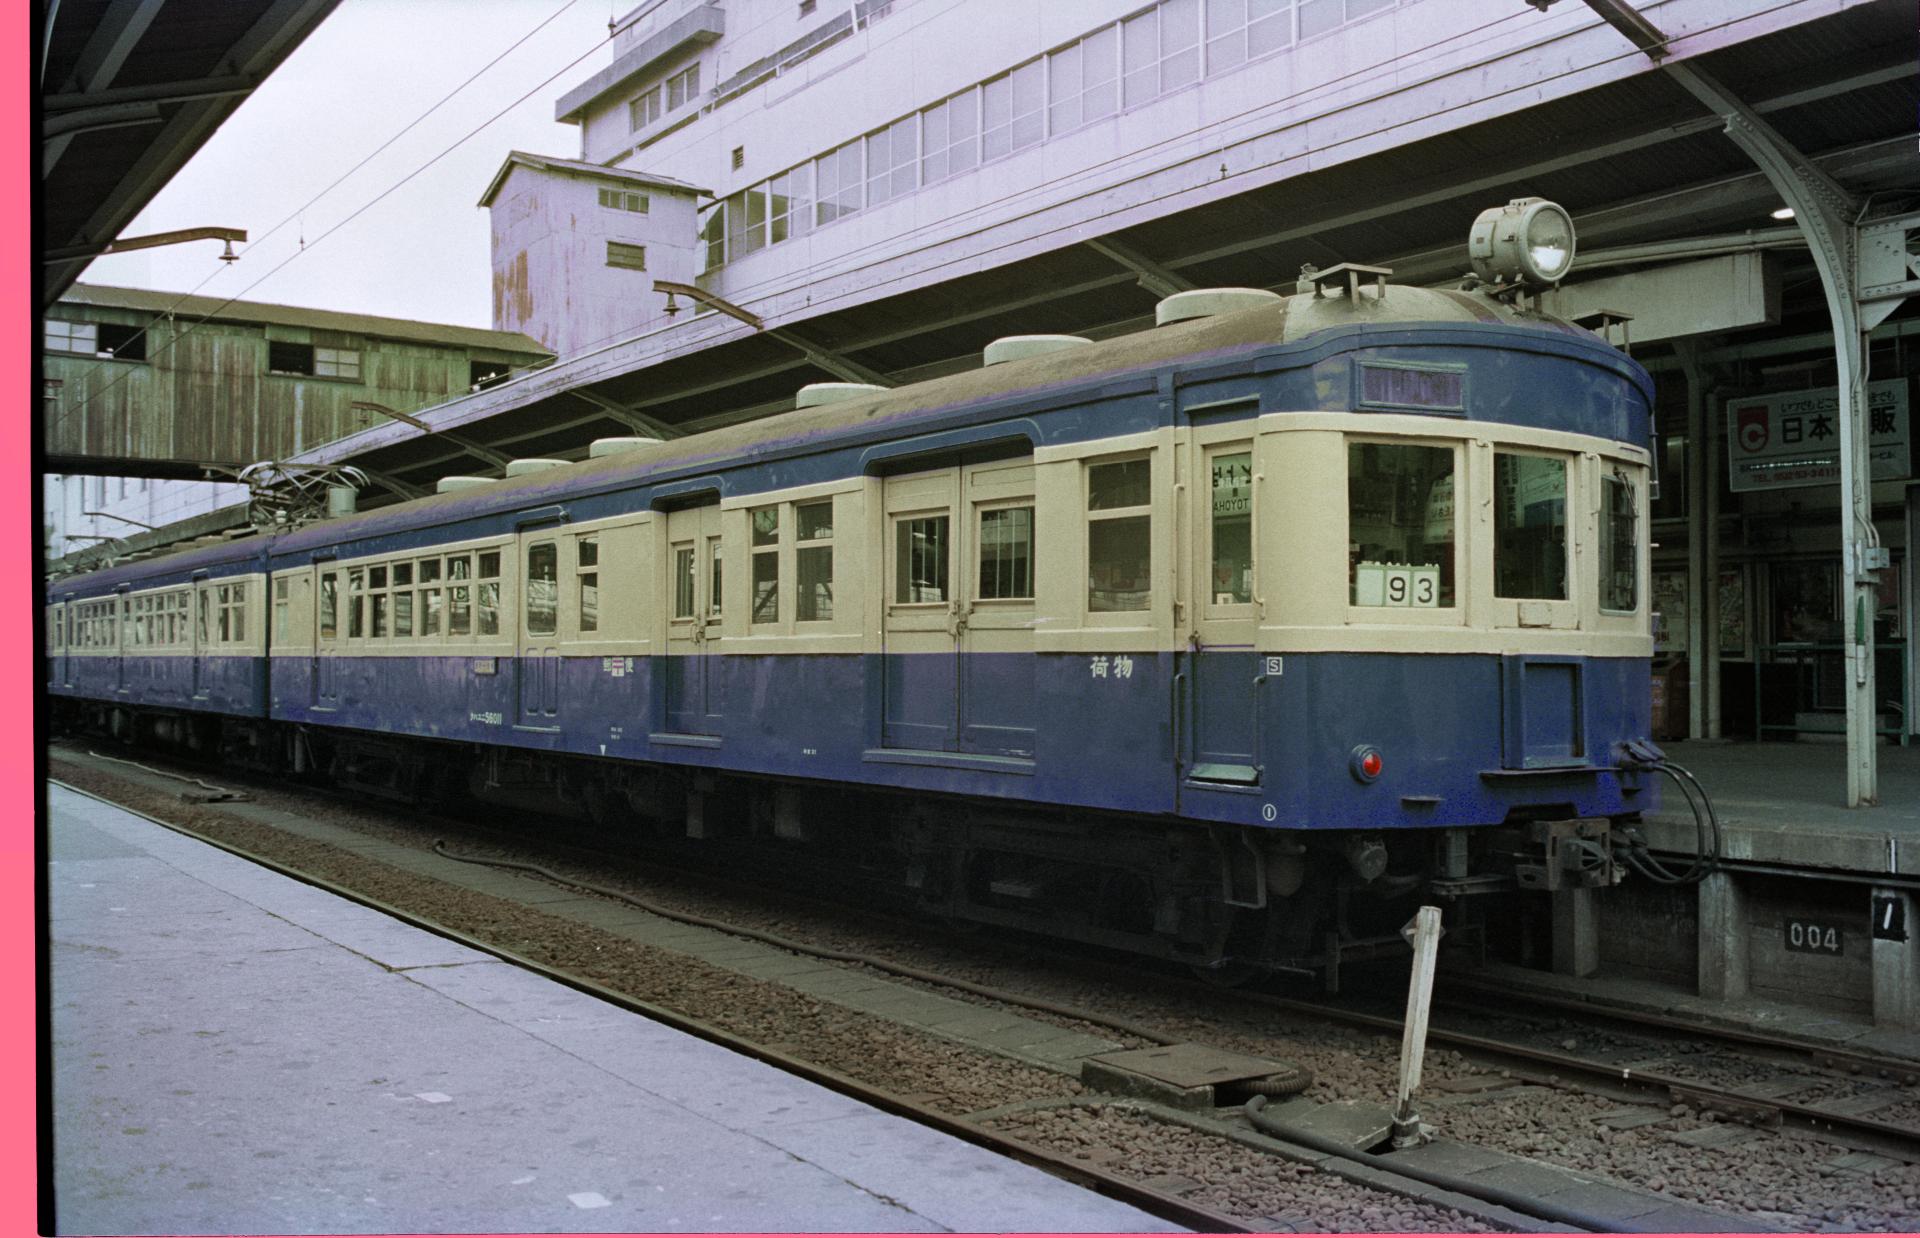 f:id:yasuo_ssi:20210605165154p:plain